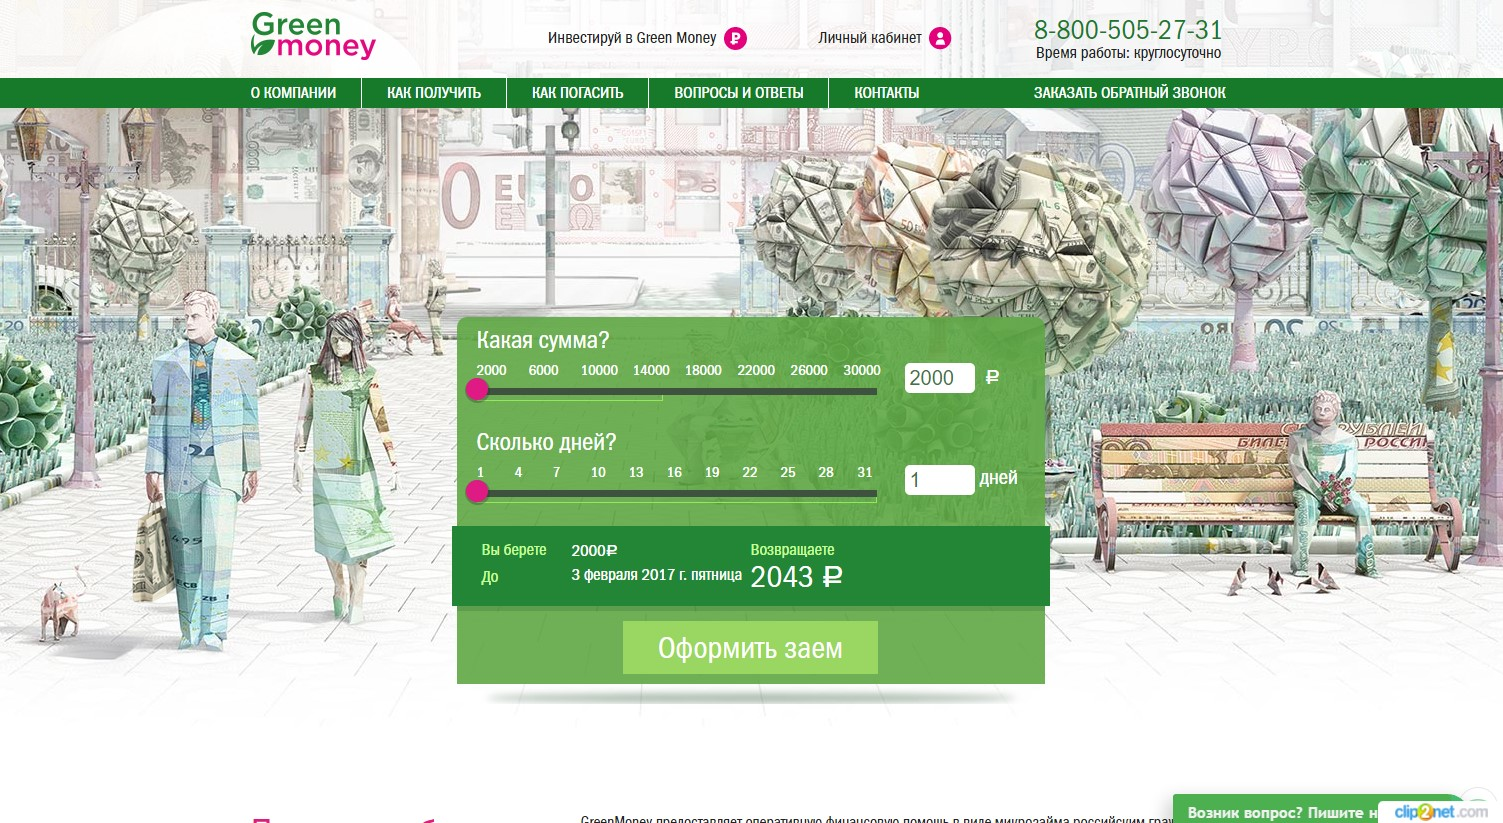 грин мани займ онлайн заявка как найти налоги по инн физического лица на сайте налоговой без регистрации